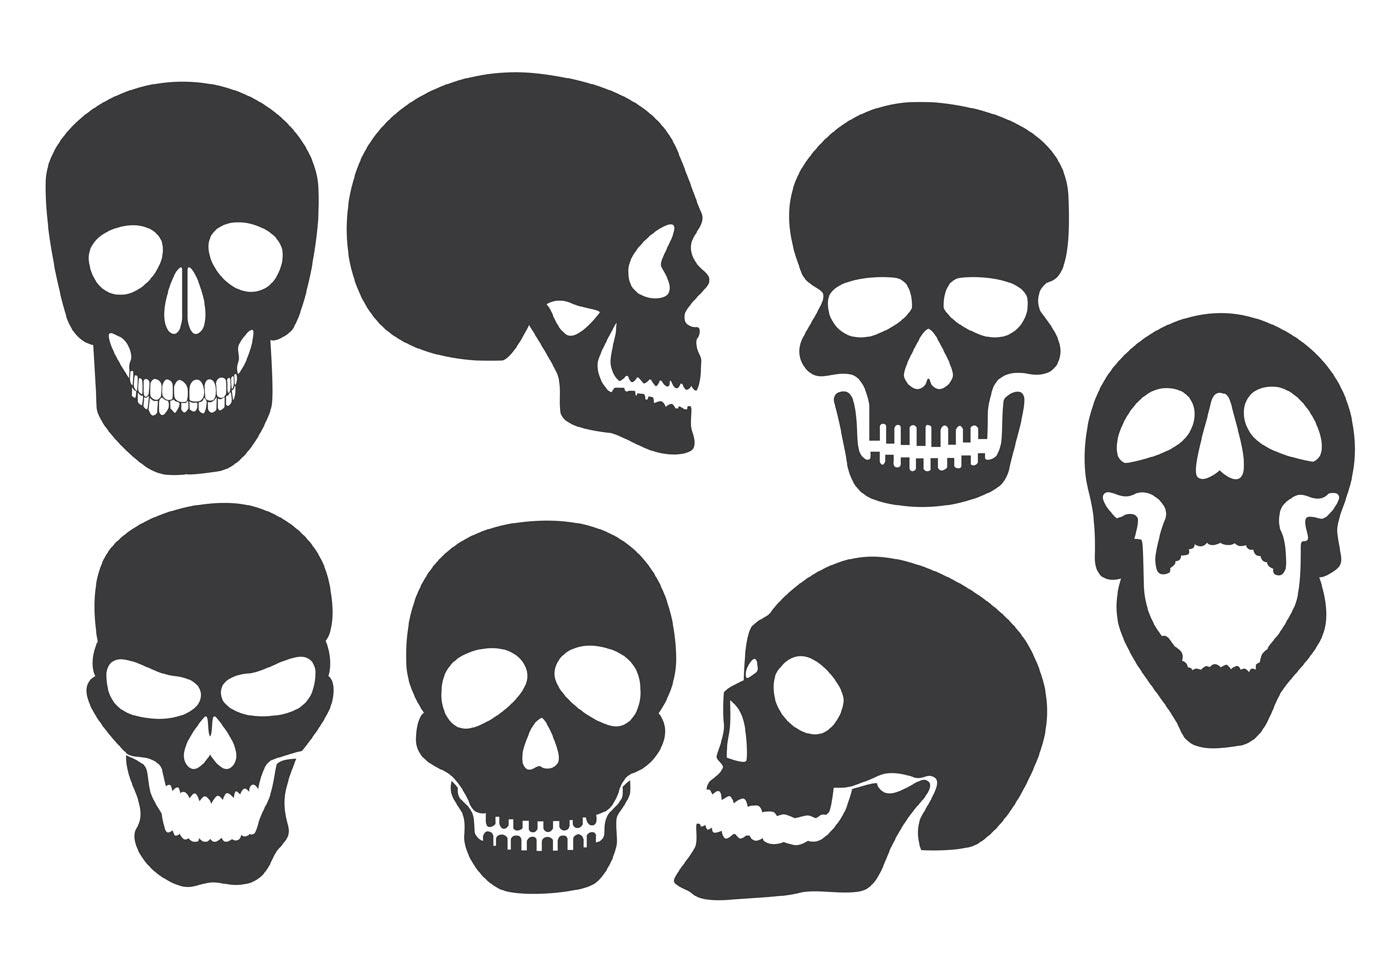 Skull vectors (780 free skull vectors).